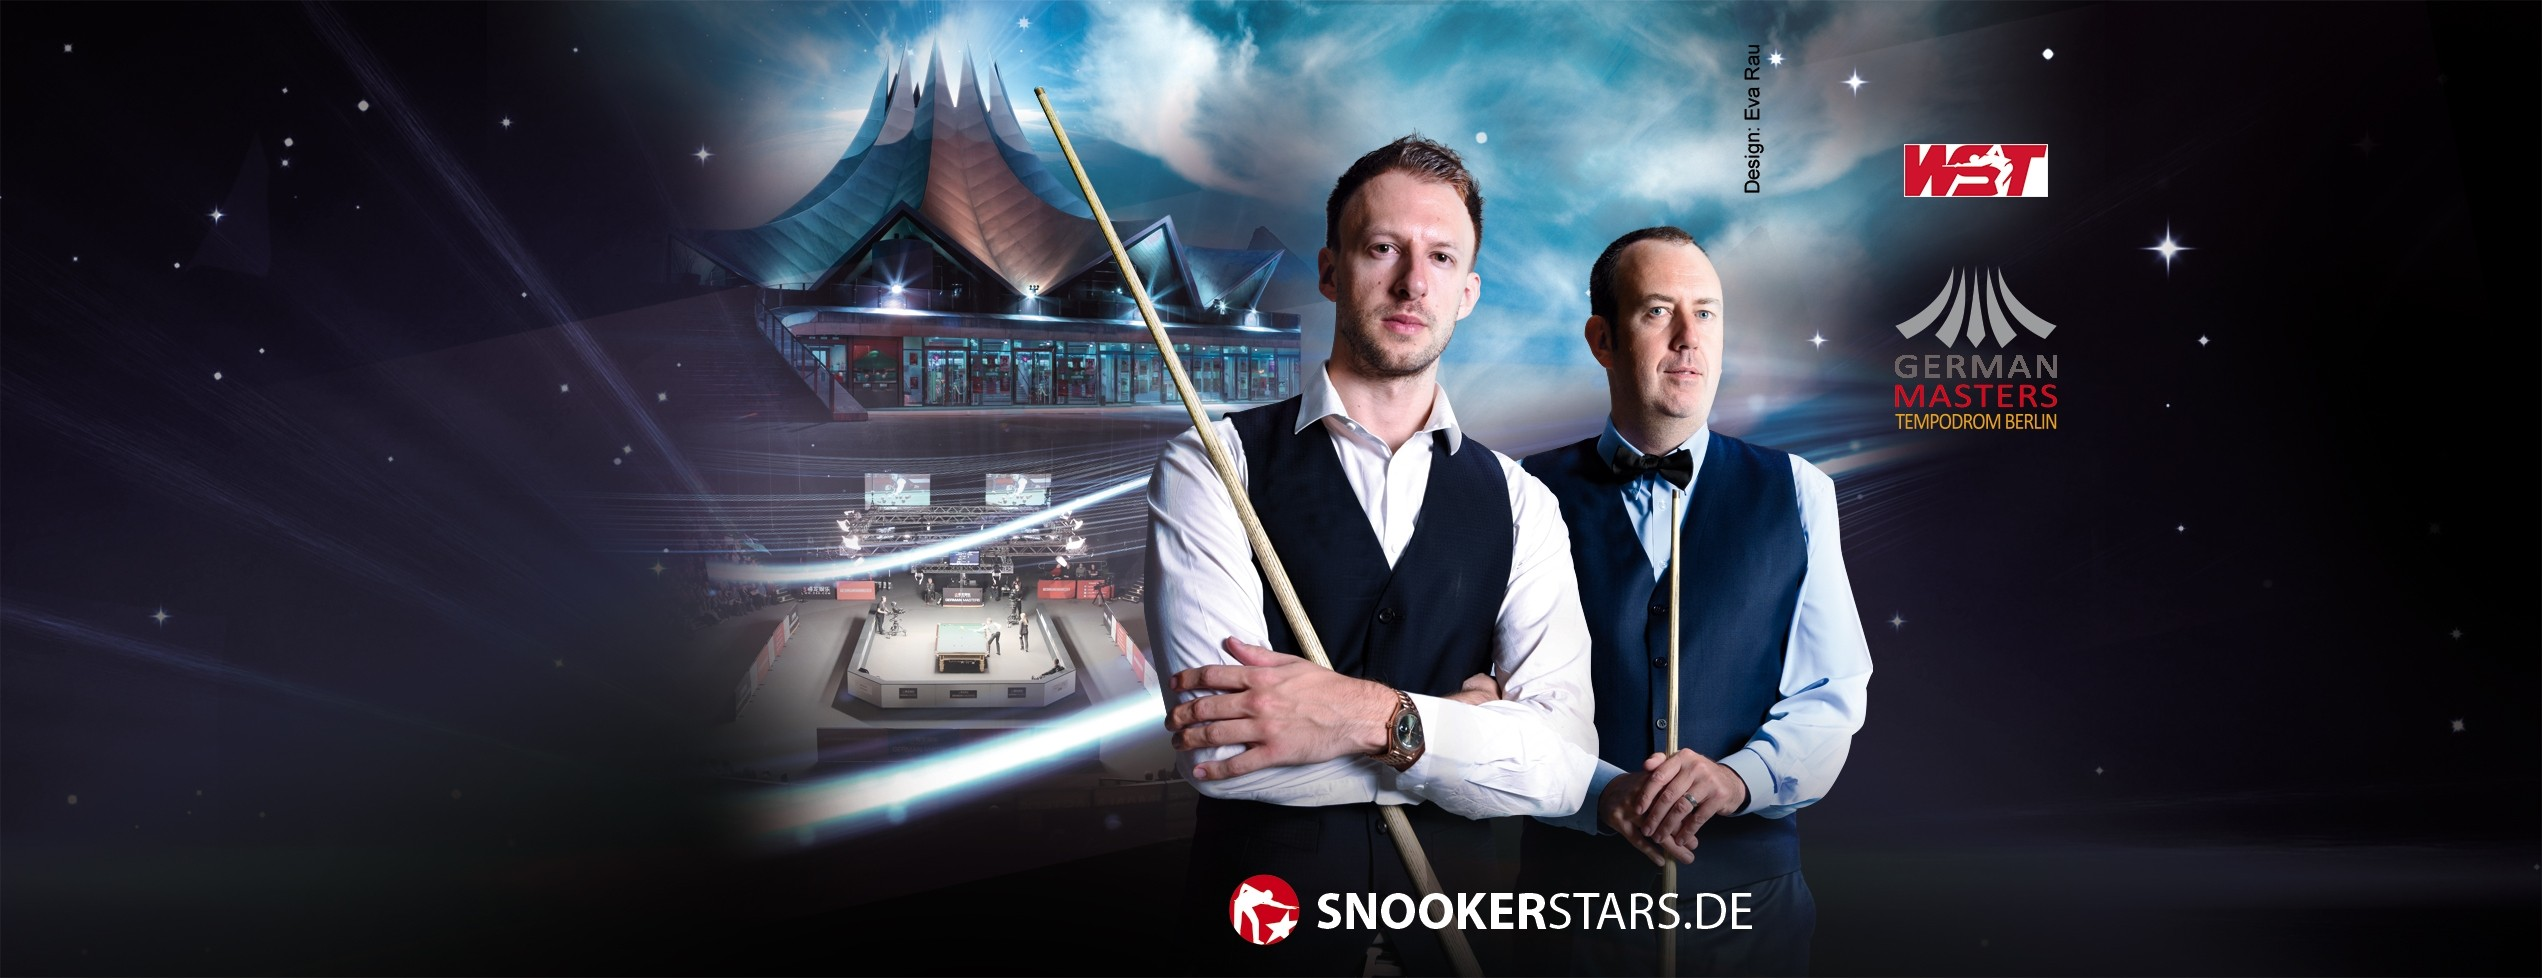 German Masters 30.01.2022 KAT 1 Abend-Session